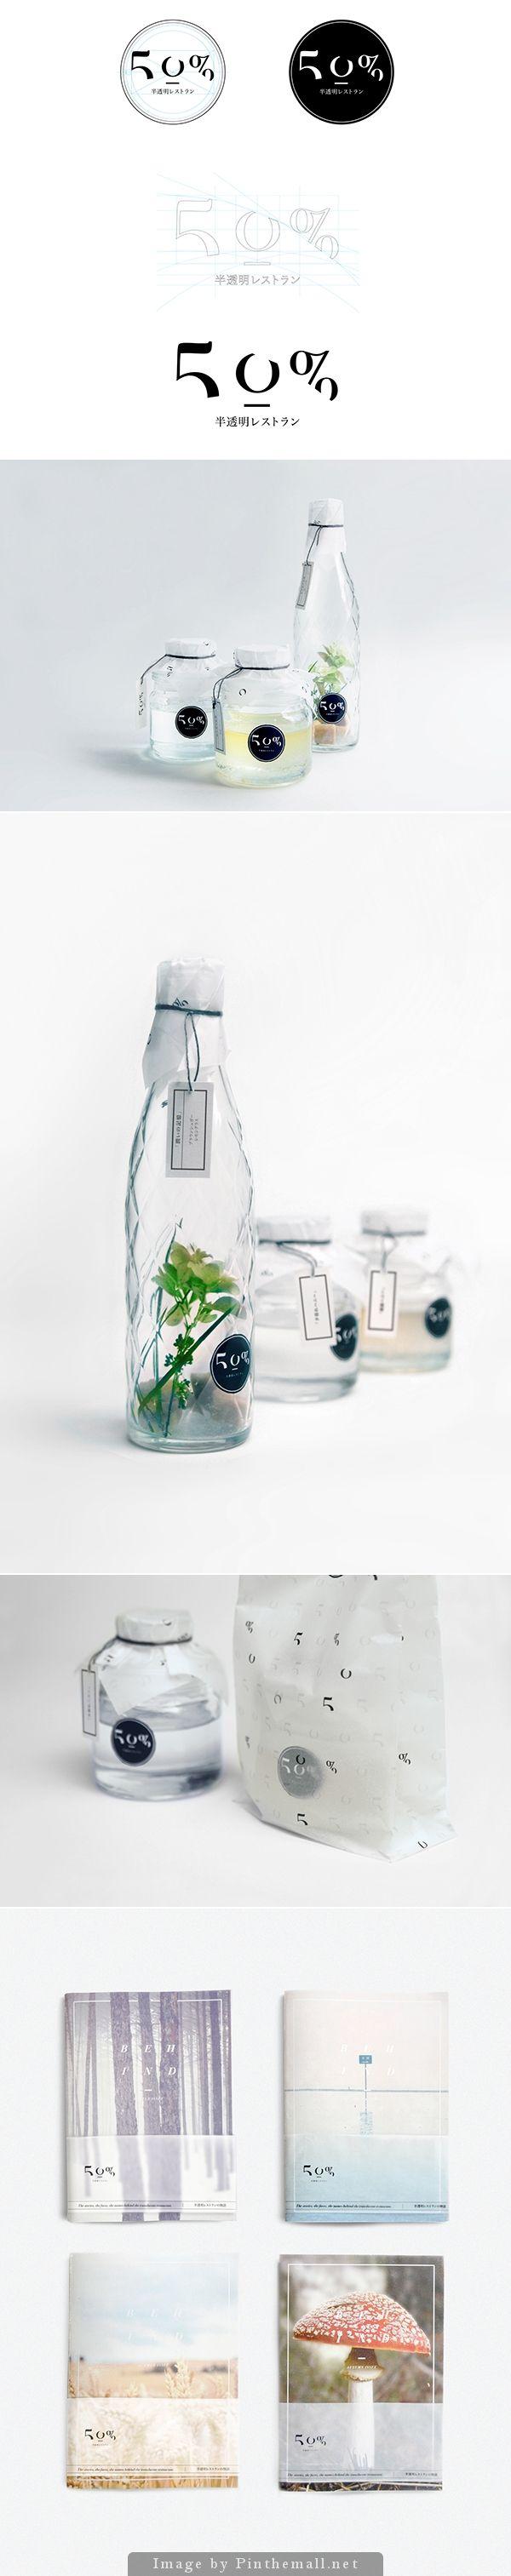 50%, a translucent restaurant by Matteo Morelli #packaging #design